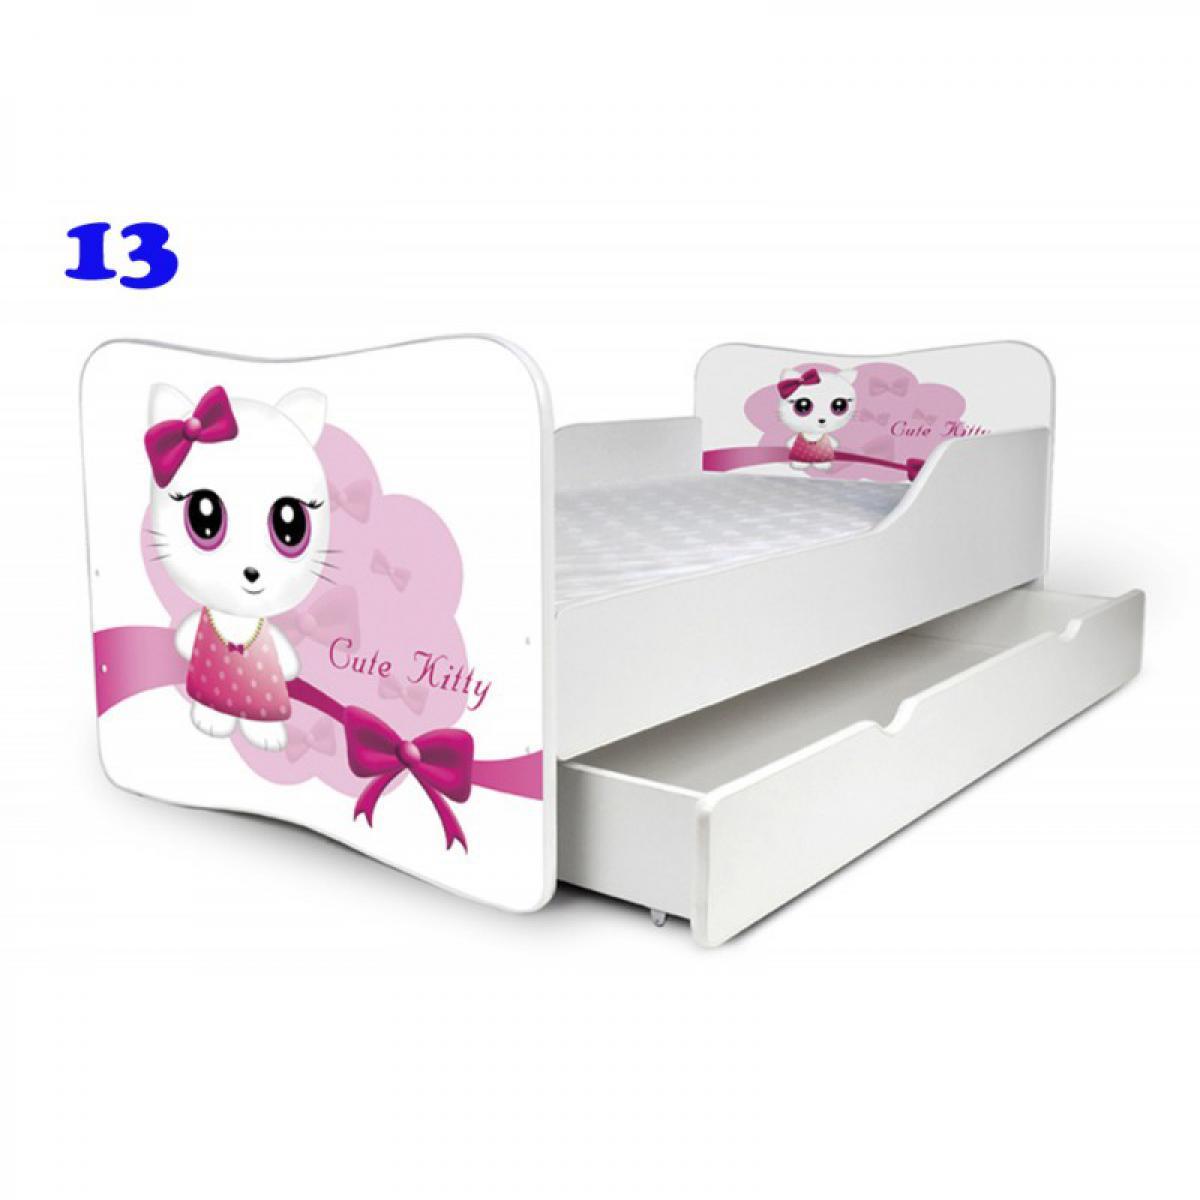 Bim Furniture Lit Enfant 140x70 cm avec Tiroir Cute Kitty Blanc avec sommier et matelas